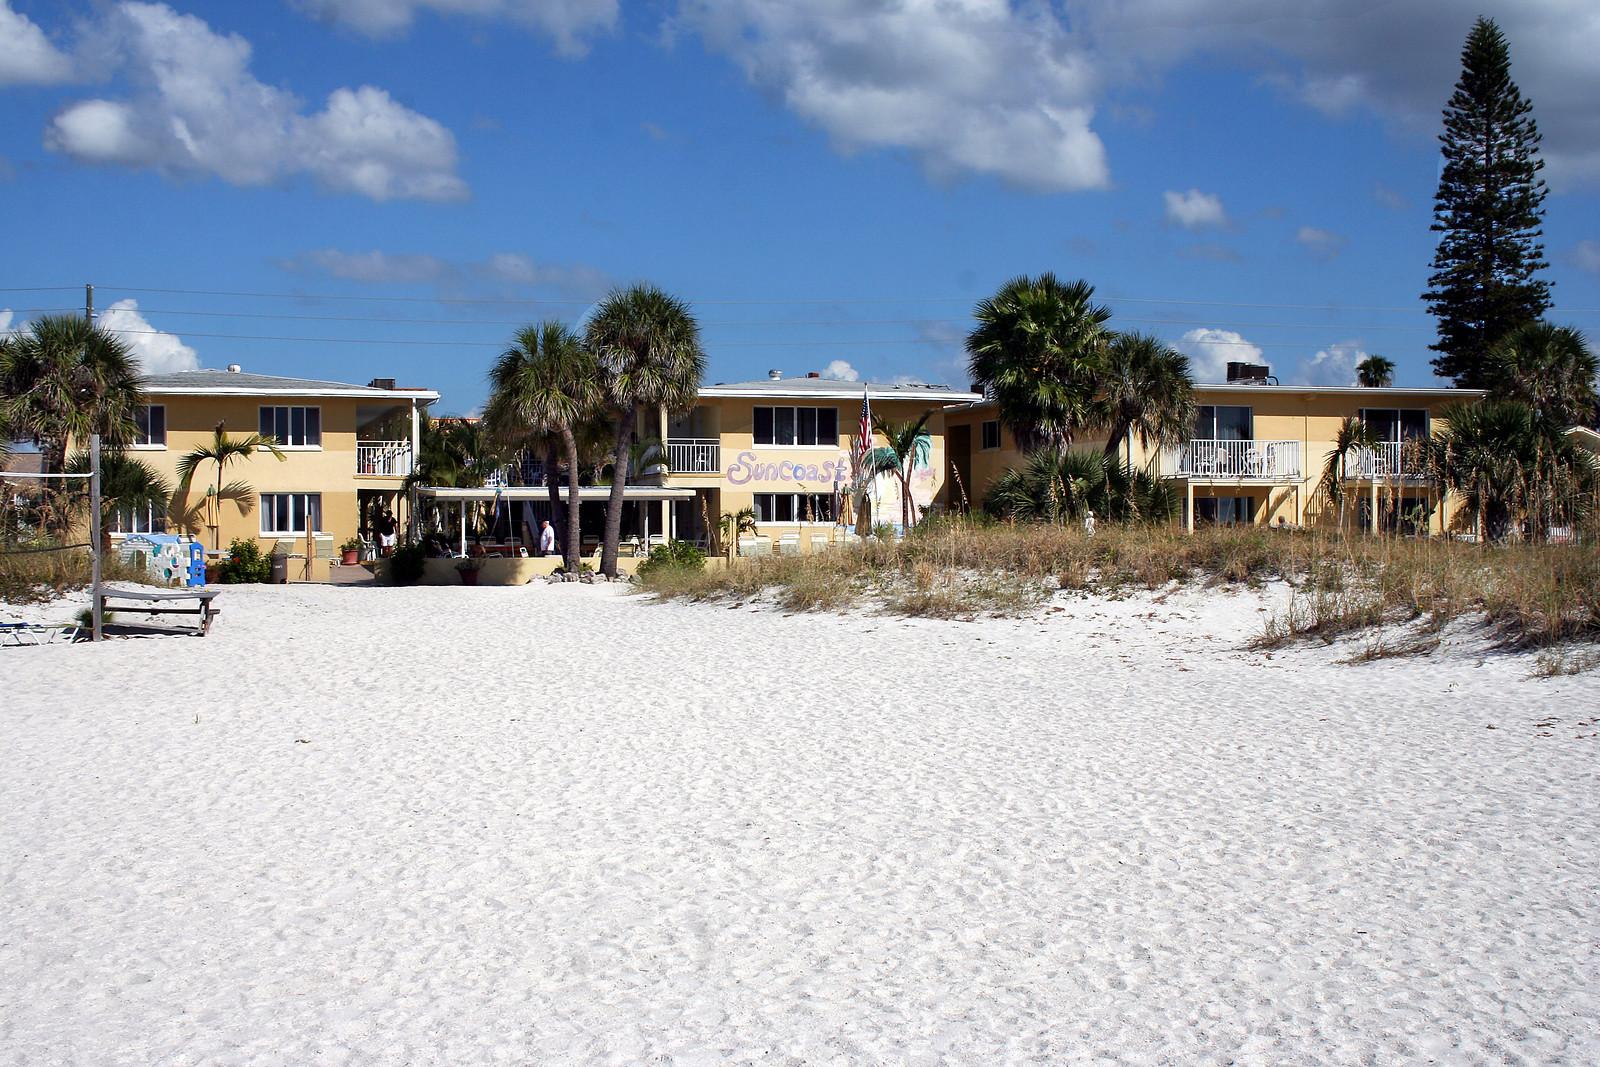 Beautiful Suncoast Motel, Treasure Island our home for a week.